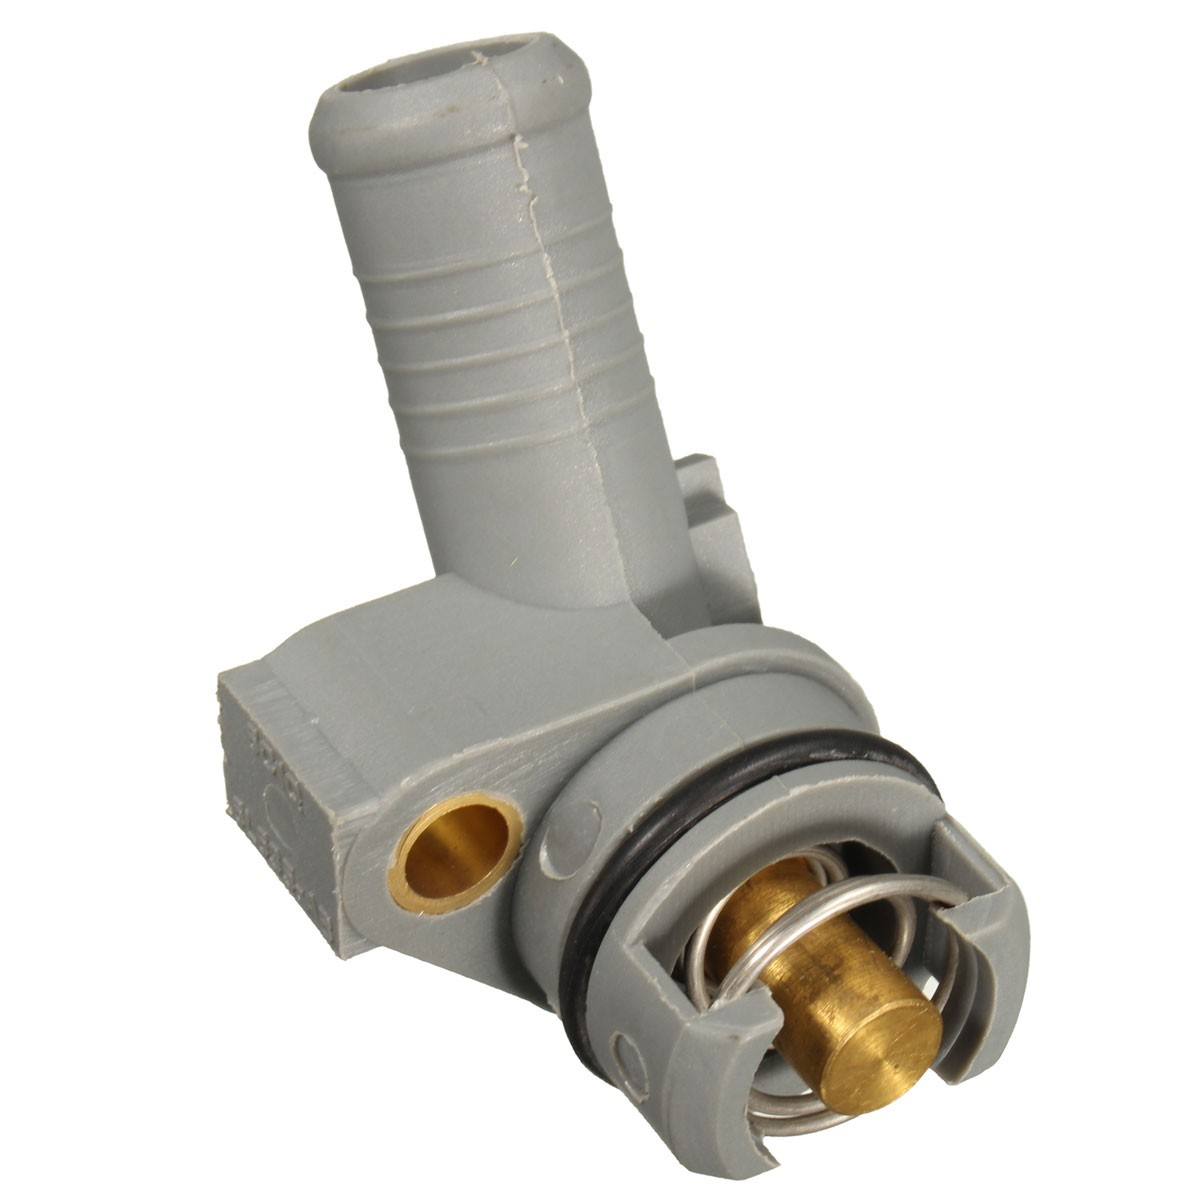 New For Ford/Mondeo MK3 2.0 & 2.2 TDDI/ TDCI/ 16V DI Oil Cooler Thermostat 1128018